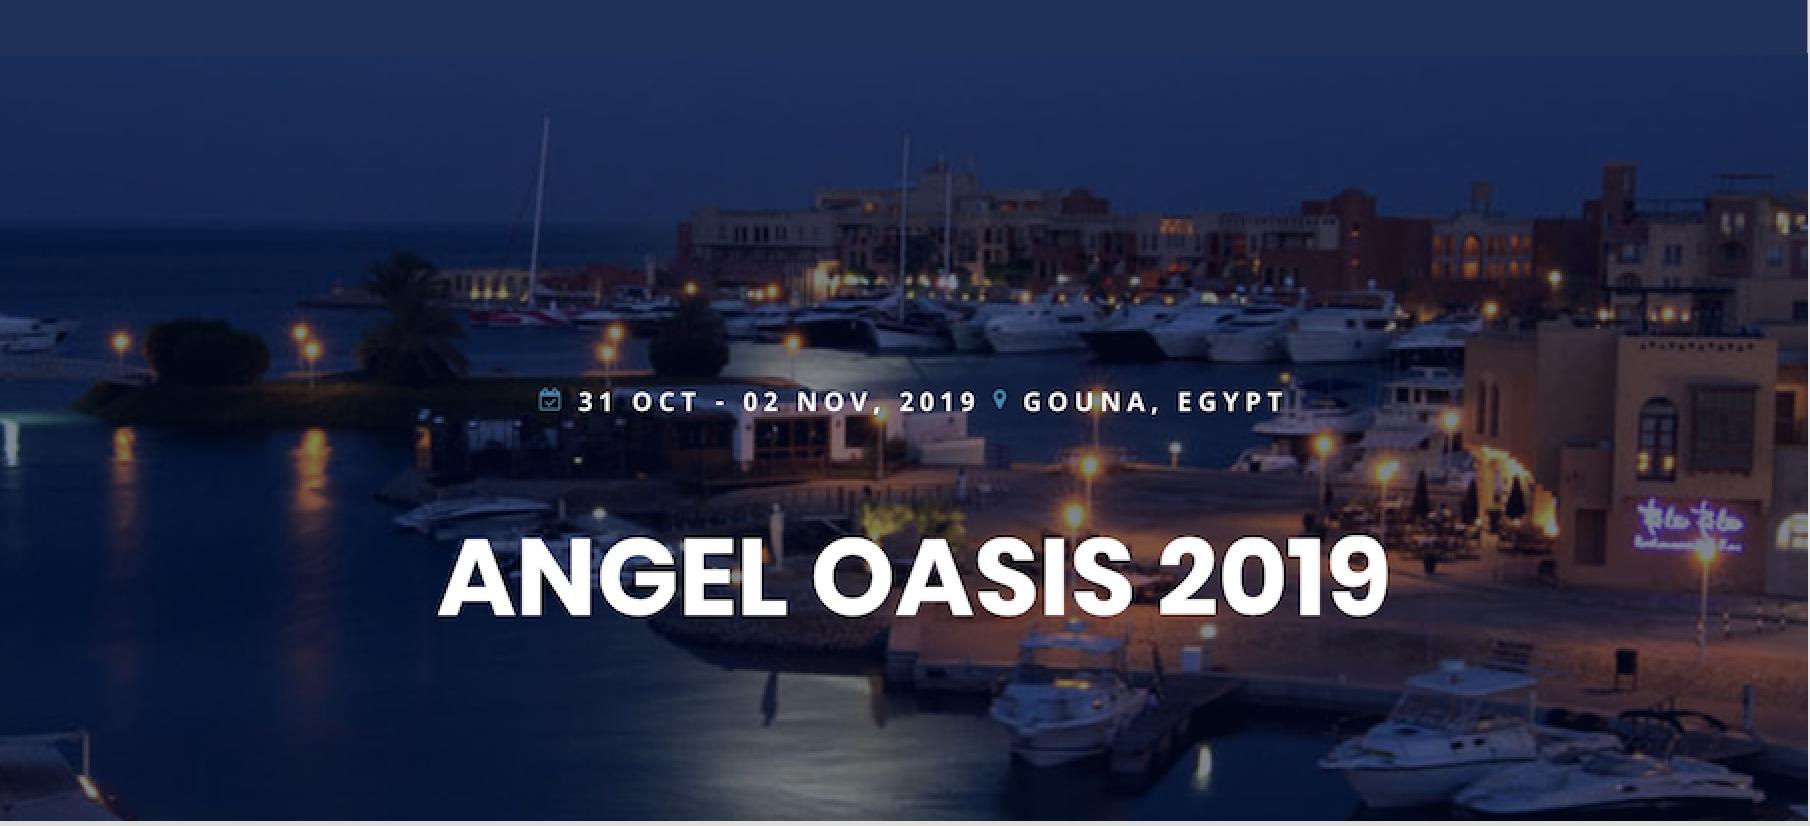 Angel Oasis 2019